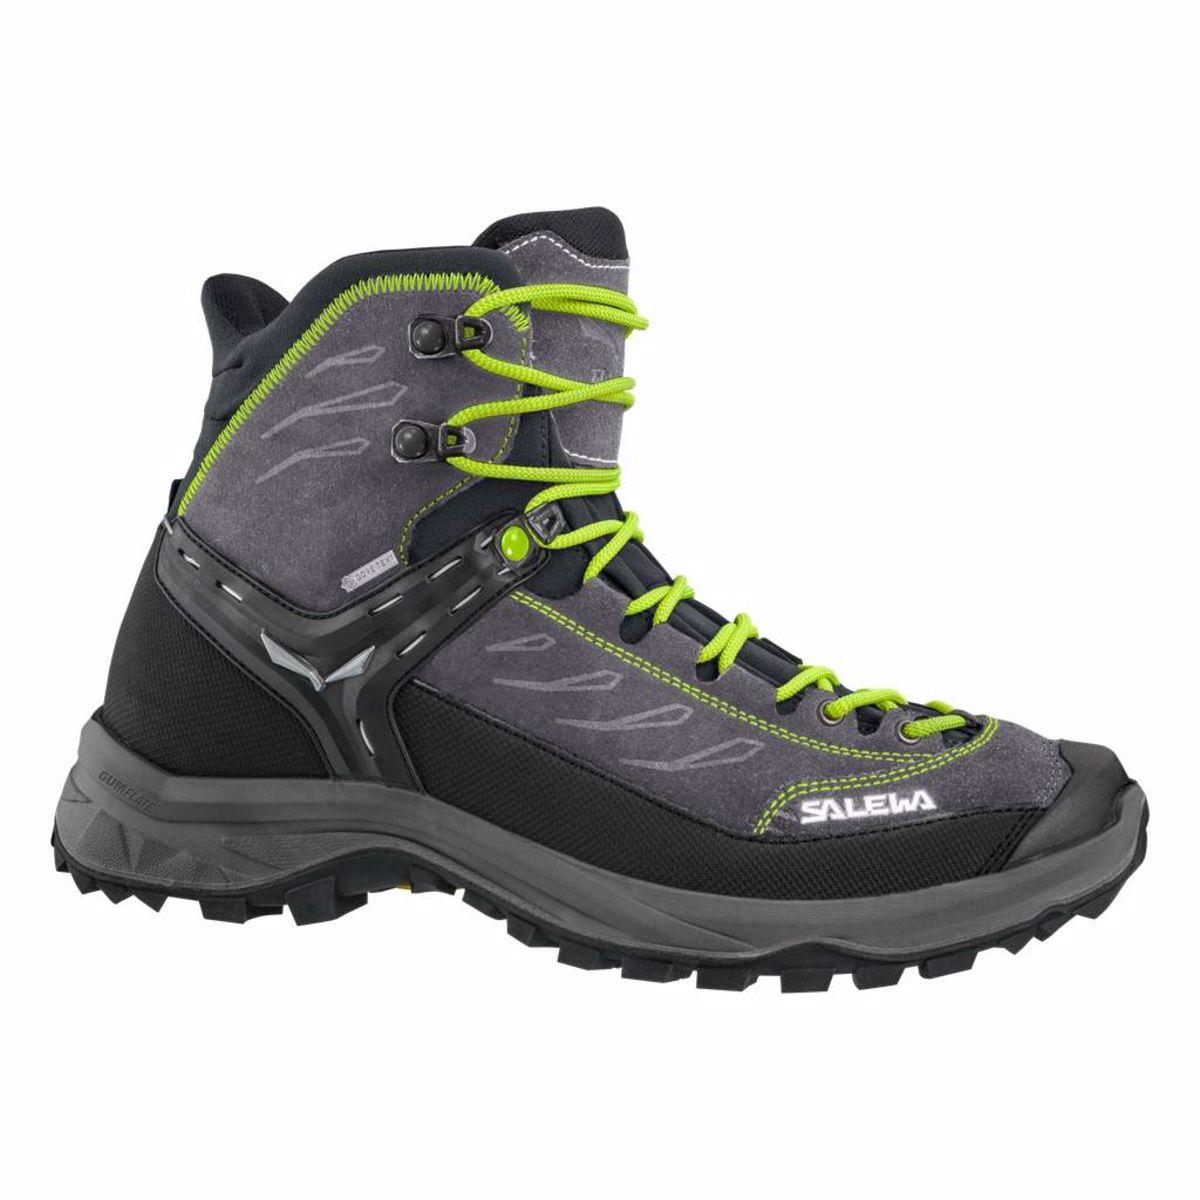 Pánske turistické topánky SALEWA MS HIKE TRAINER MID GTX Black Out Green 17baf7f3e1